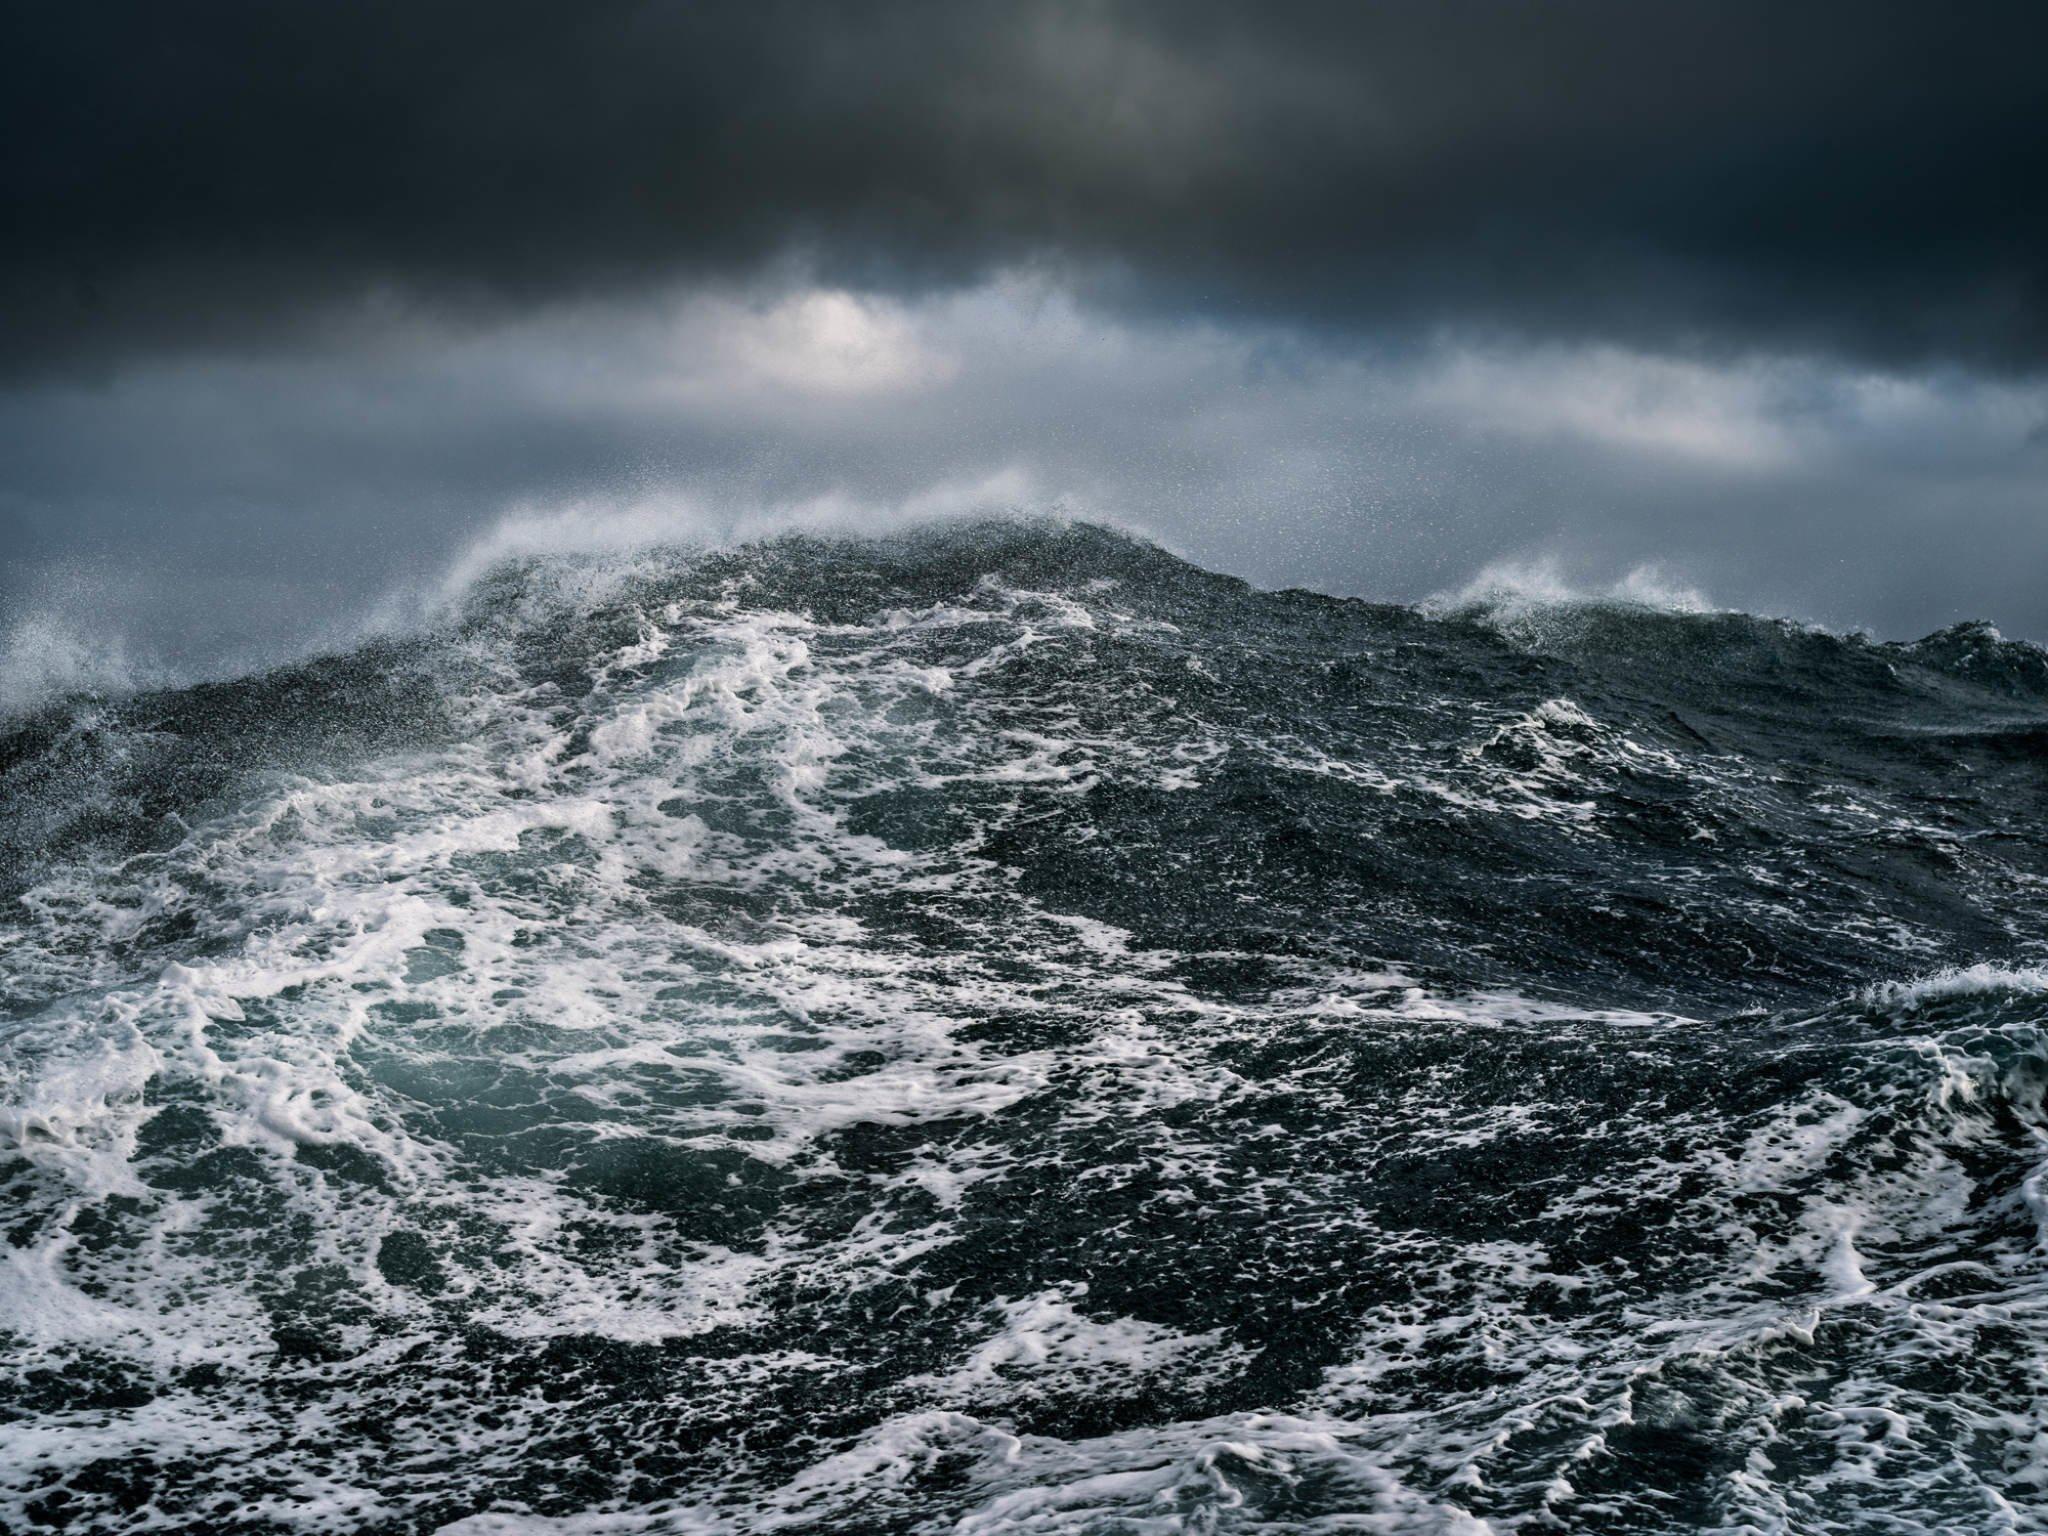 Океан картинки темные